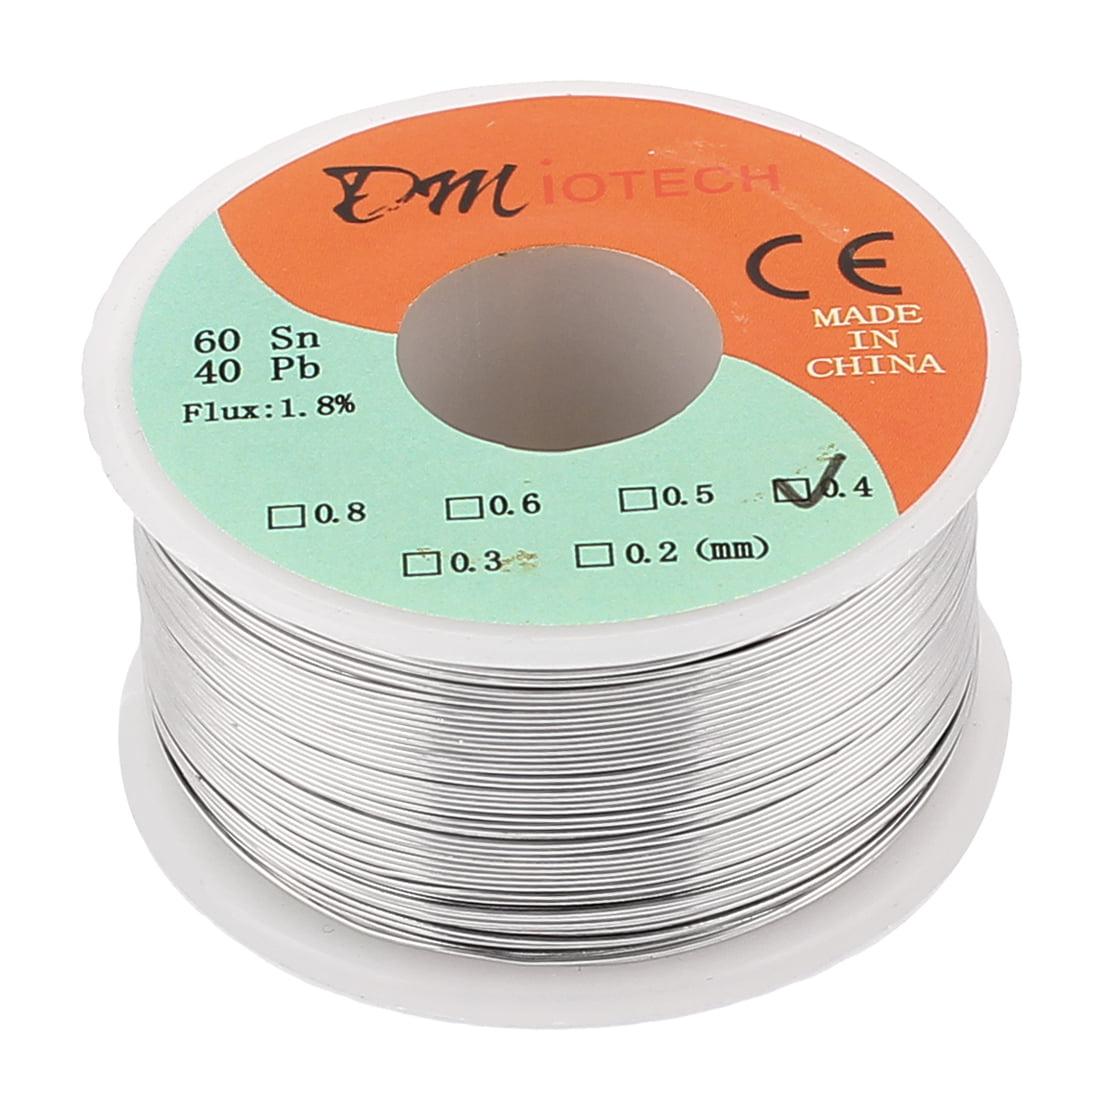 DMiotech 0.4mm 150G 60/40 Rosin Core Tin  Roll Soldering Solder Wire